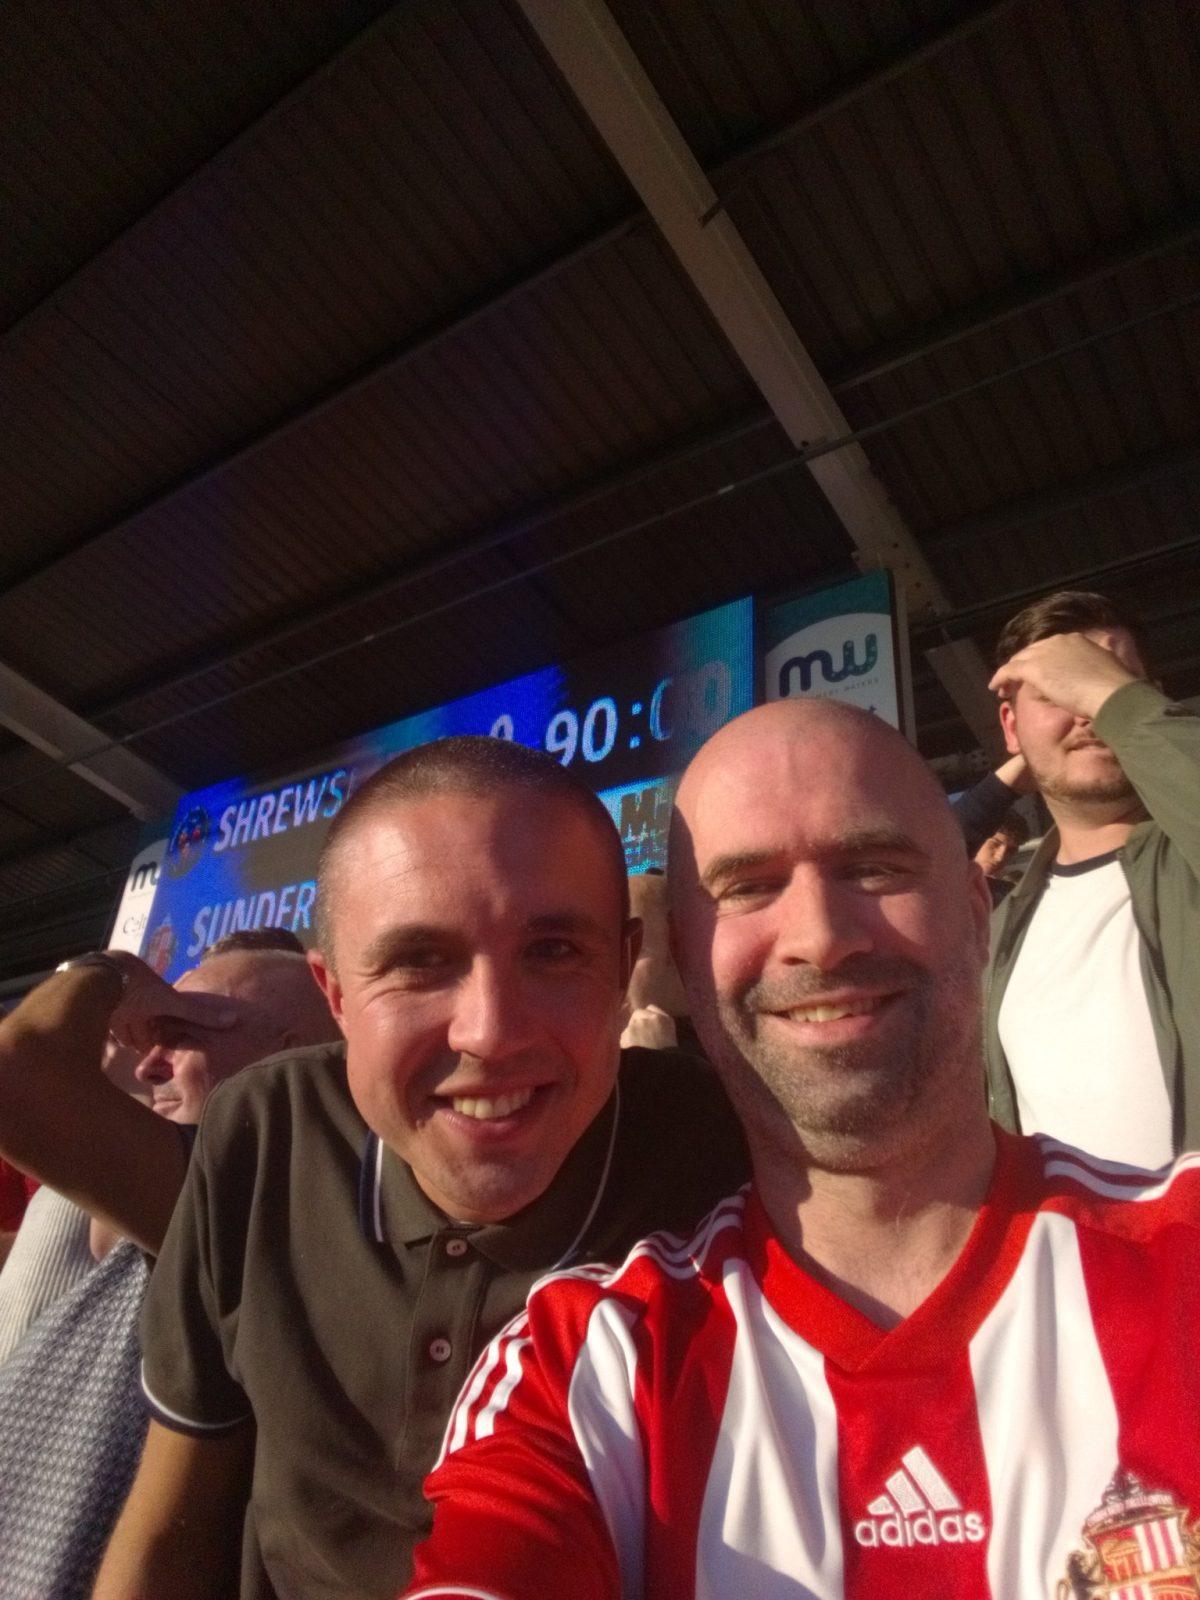 Shrewsbury Town v Sunderland 20-10-2018